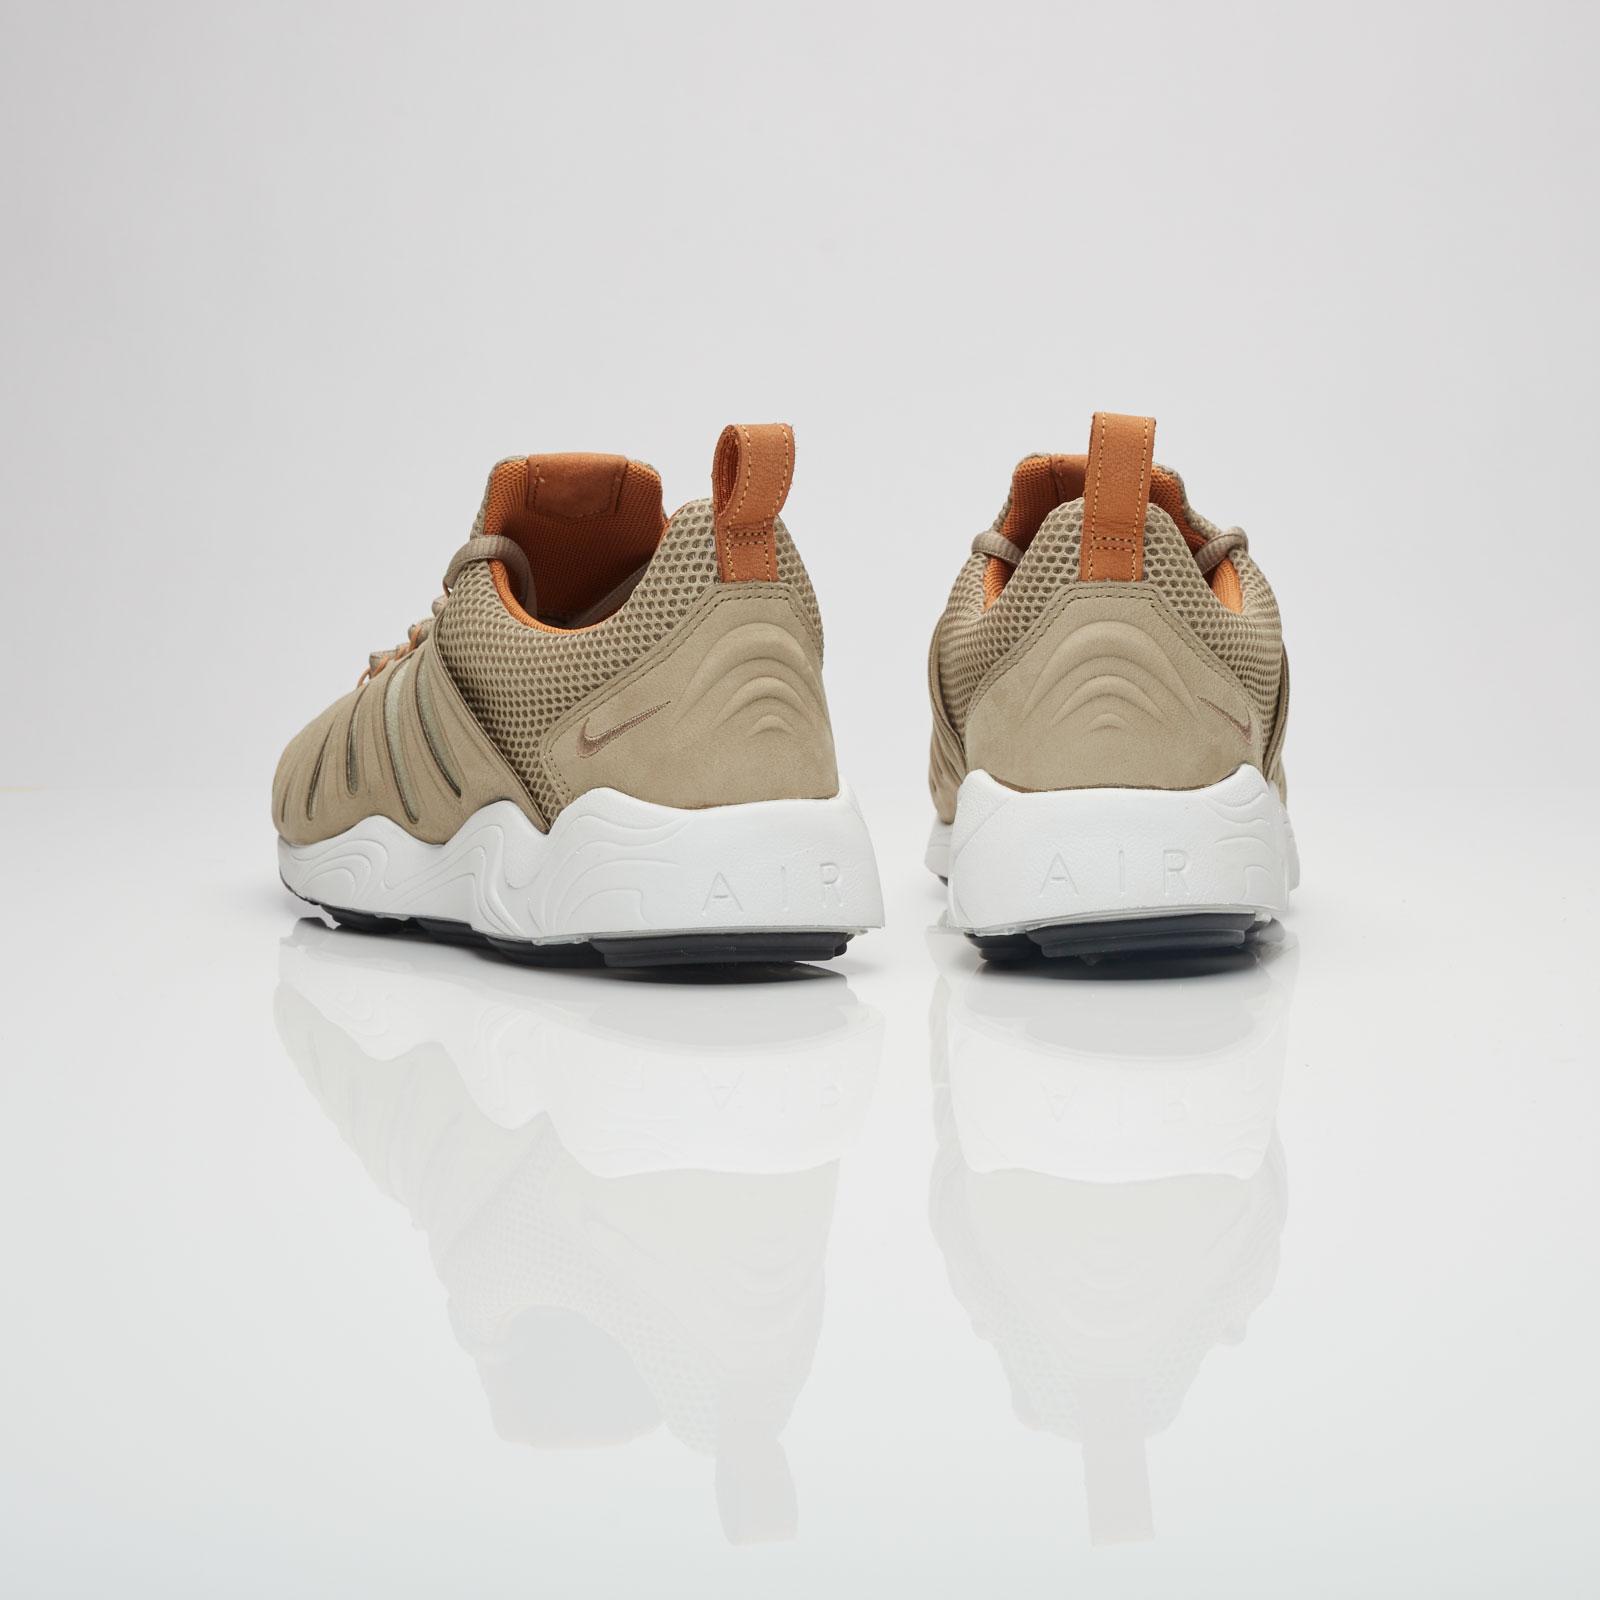 d02791cf6bf7 Nike Sportswear Air Zoom Spirimic Nike Sportswear Air Zoom Spirimic ...